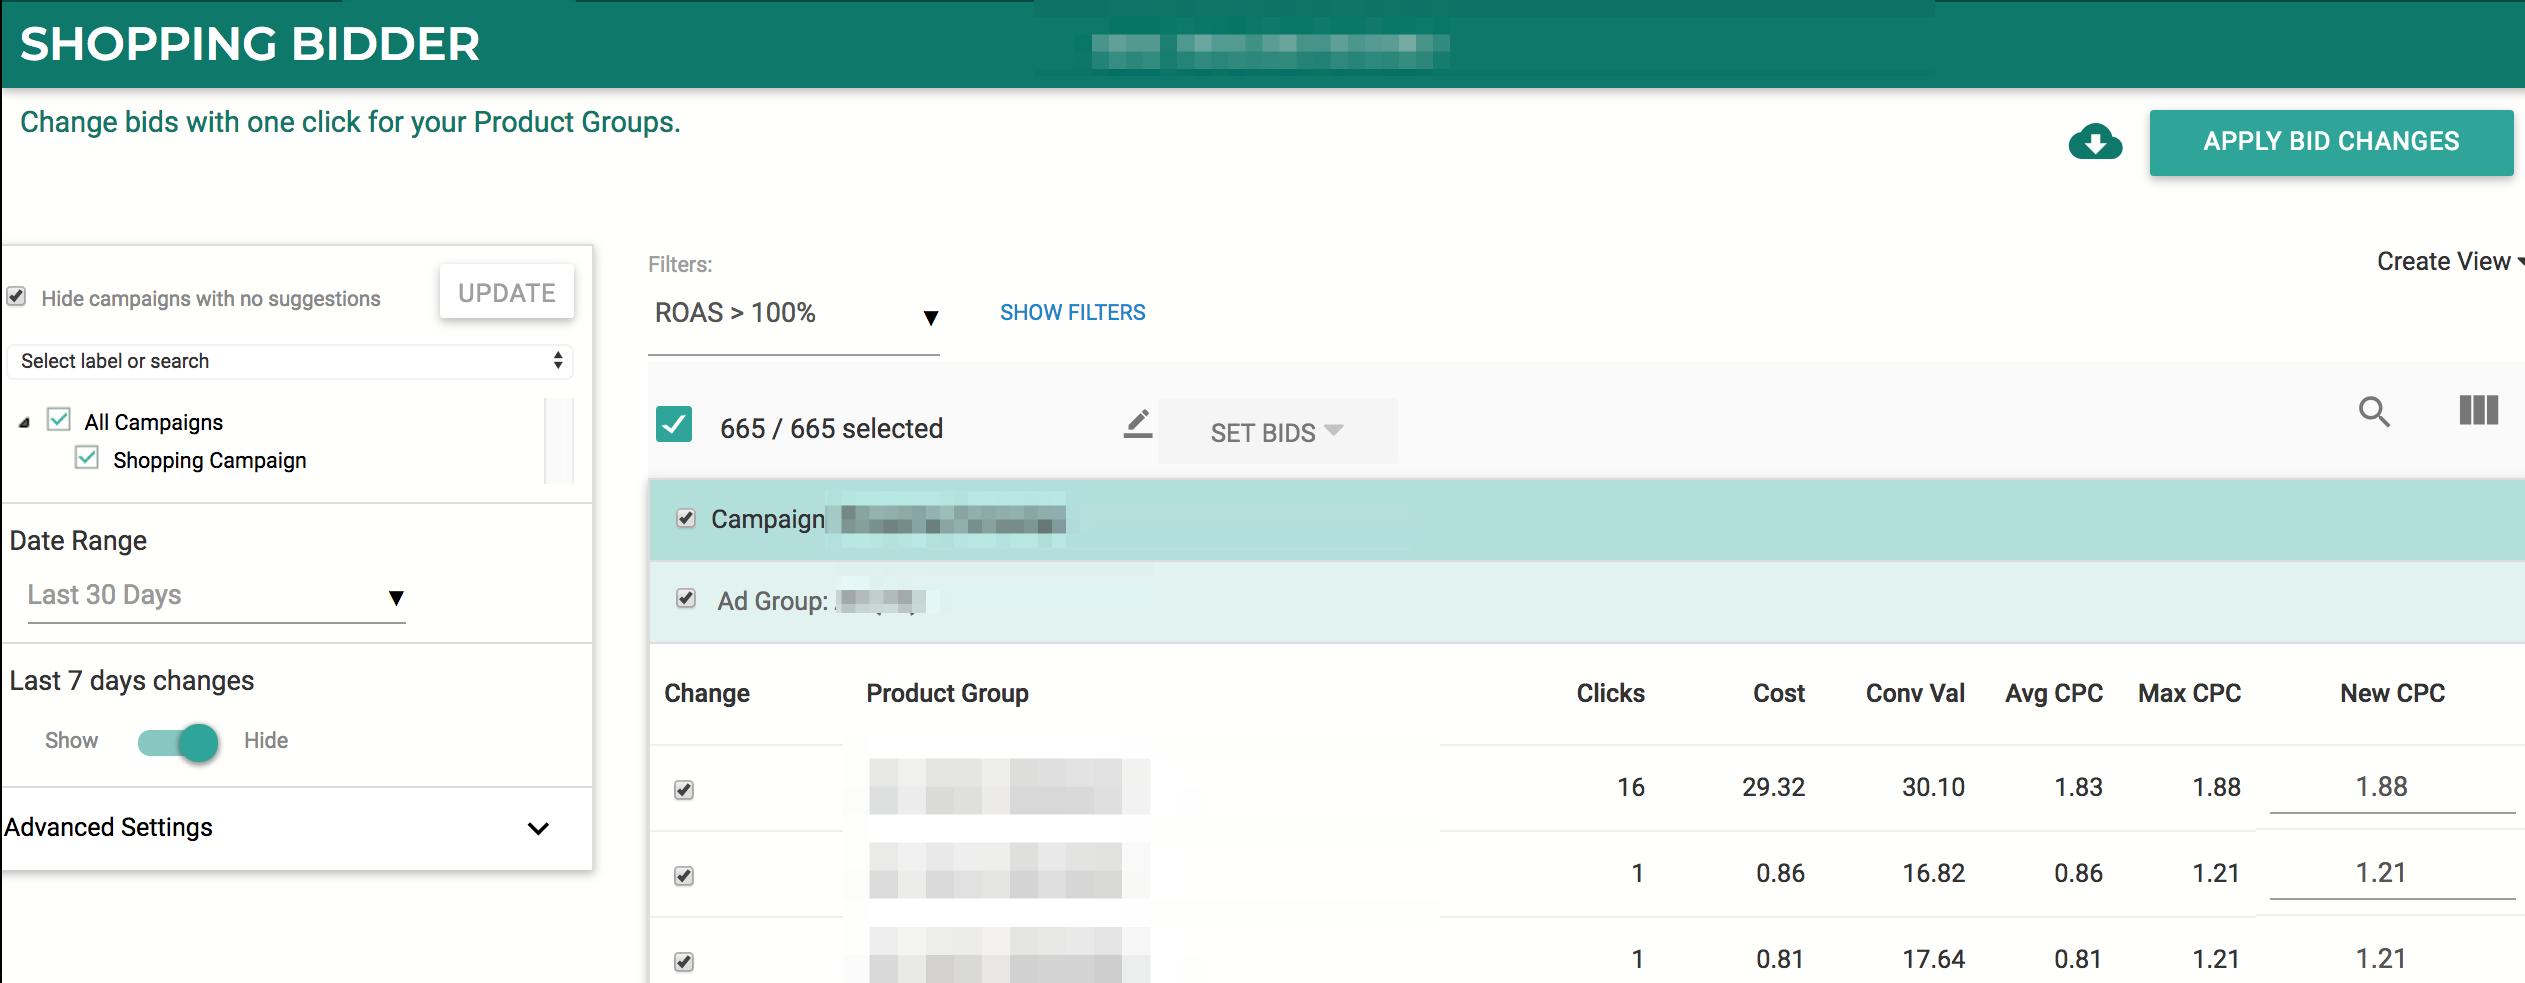 Bid Management For Google Shopping Ads Made Easy Optmyzr Blog